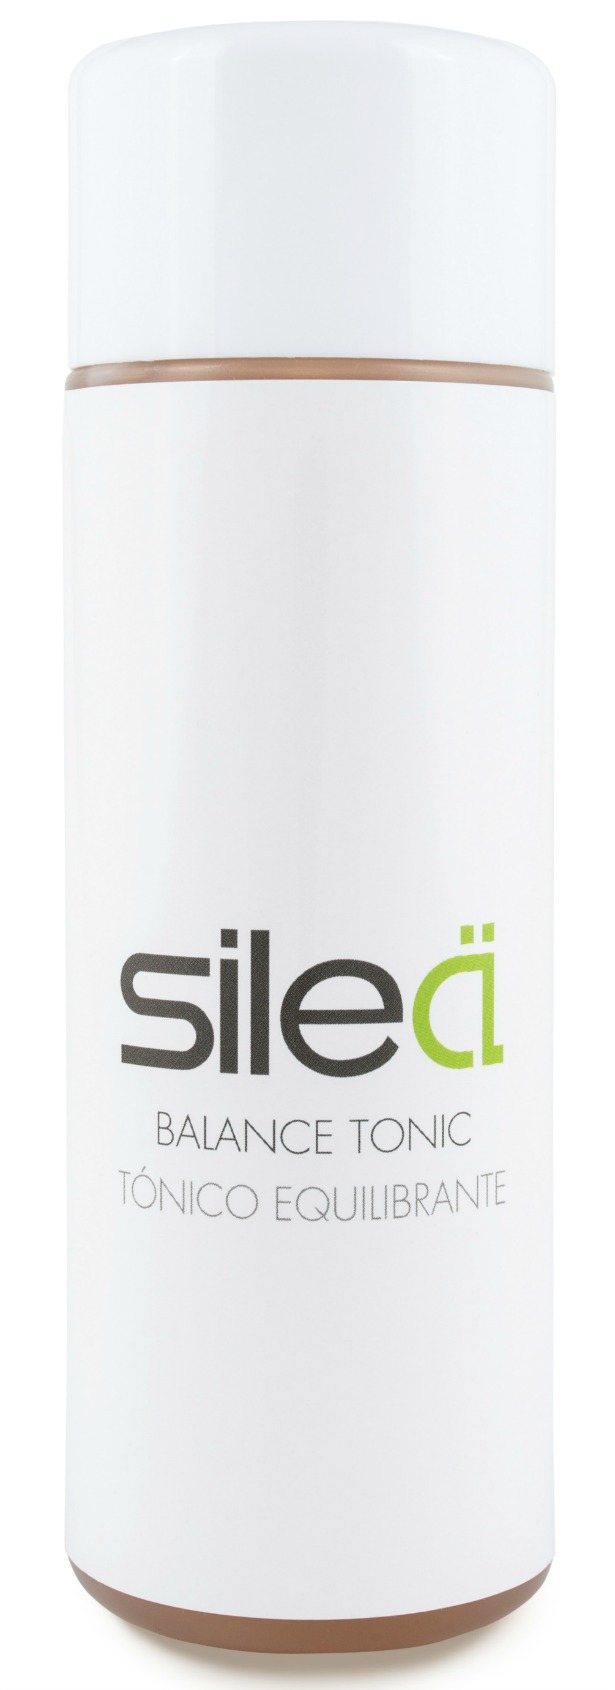 Balance Tonic